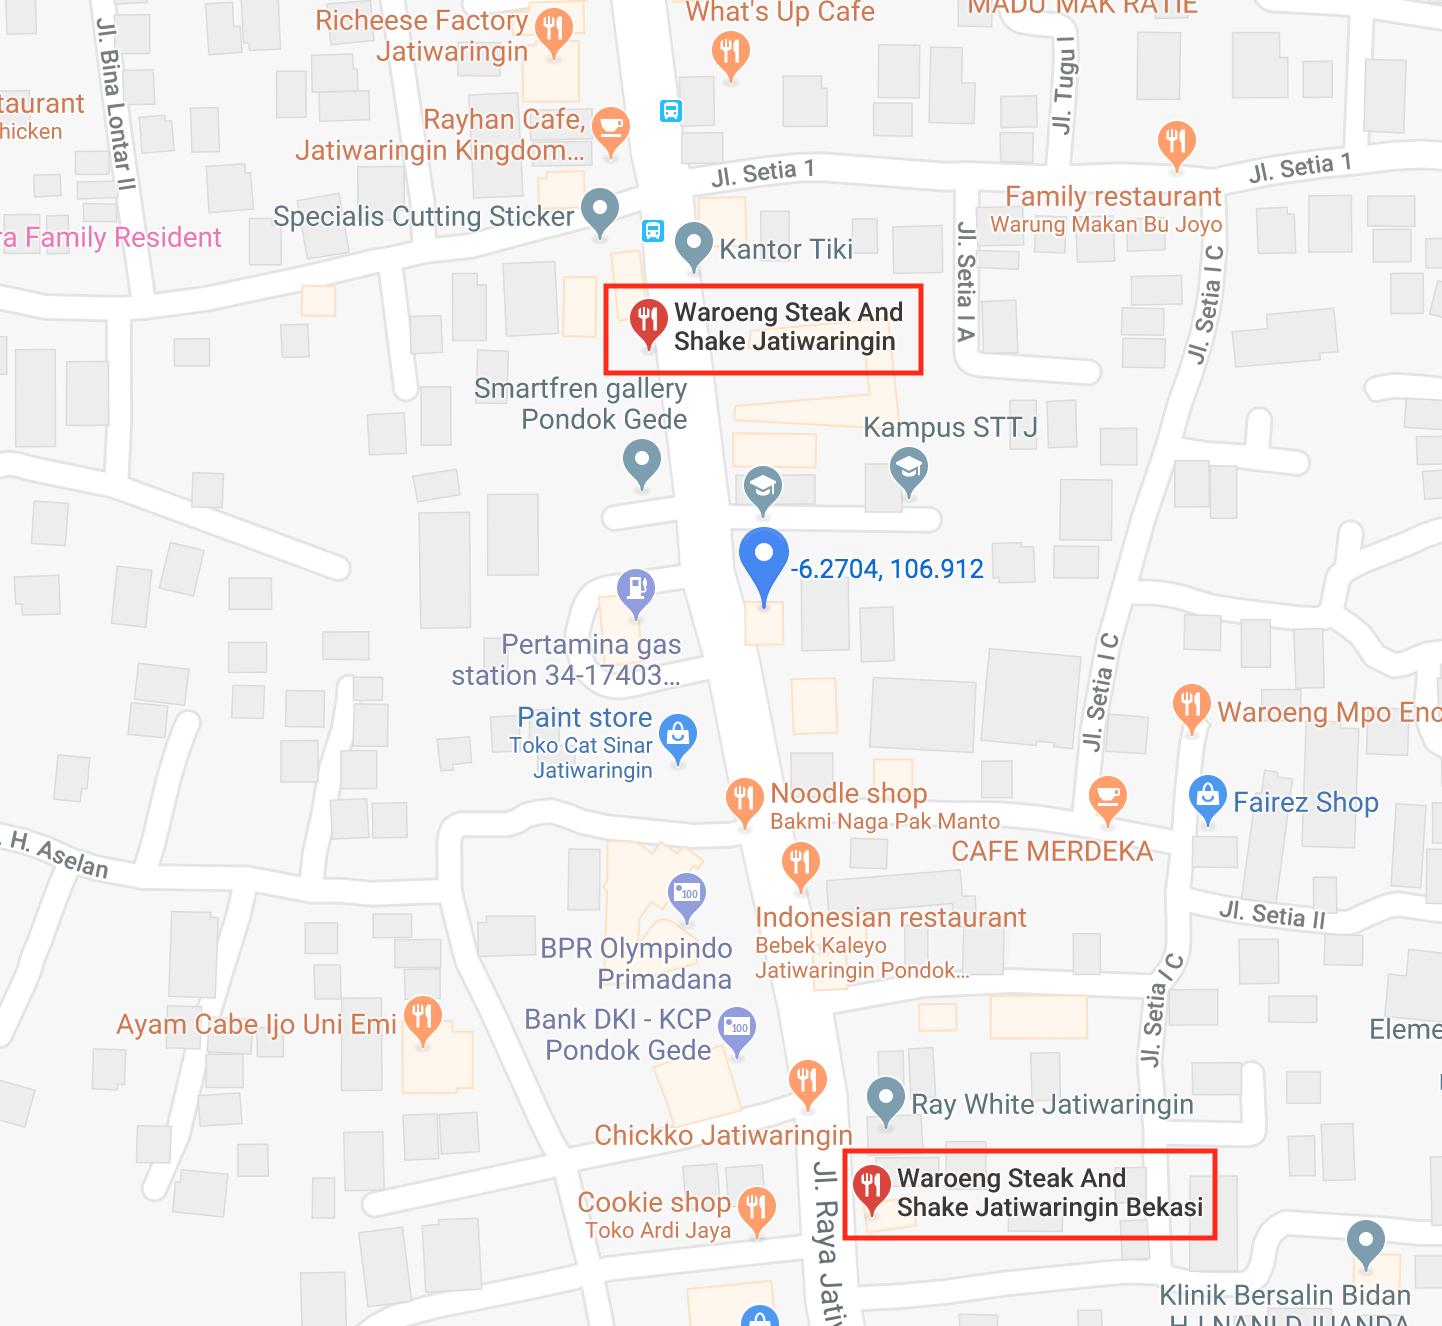 Waroeng Steak and Shake map location on Google Maps